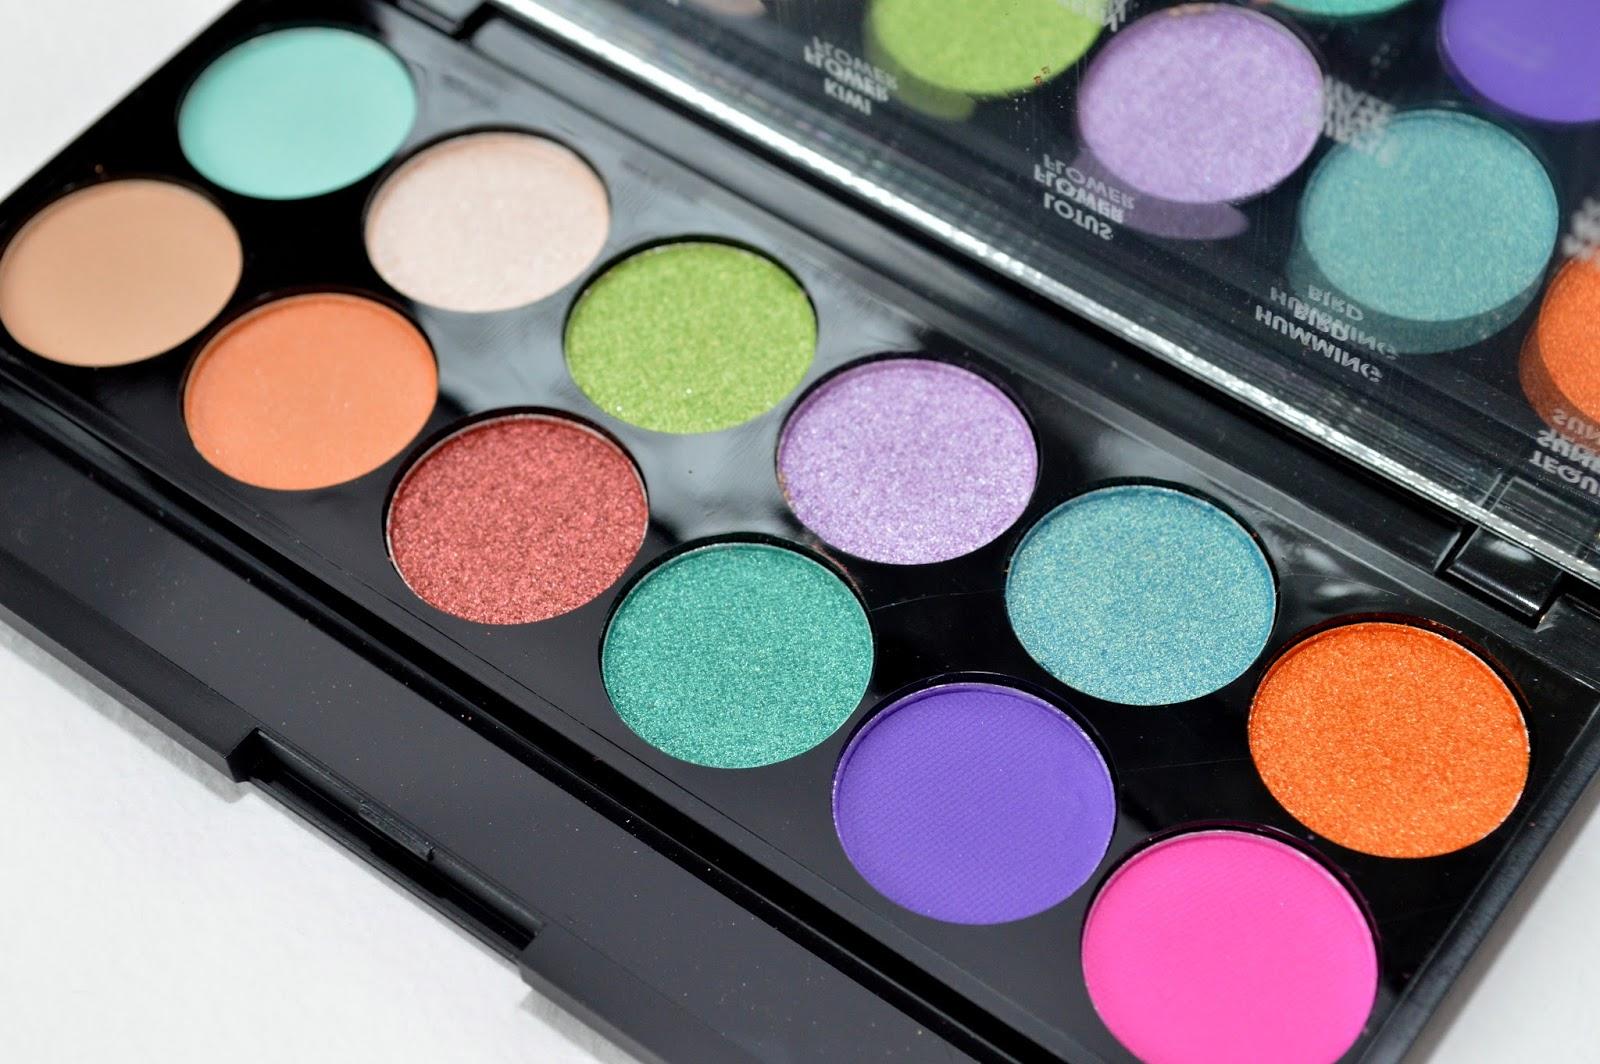 Картинки по запросу Sleek Make Up 732 Snapshots